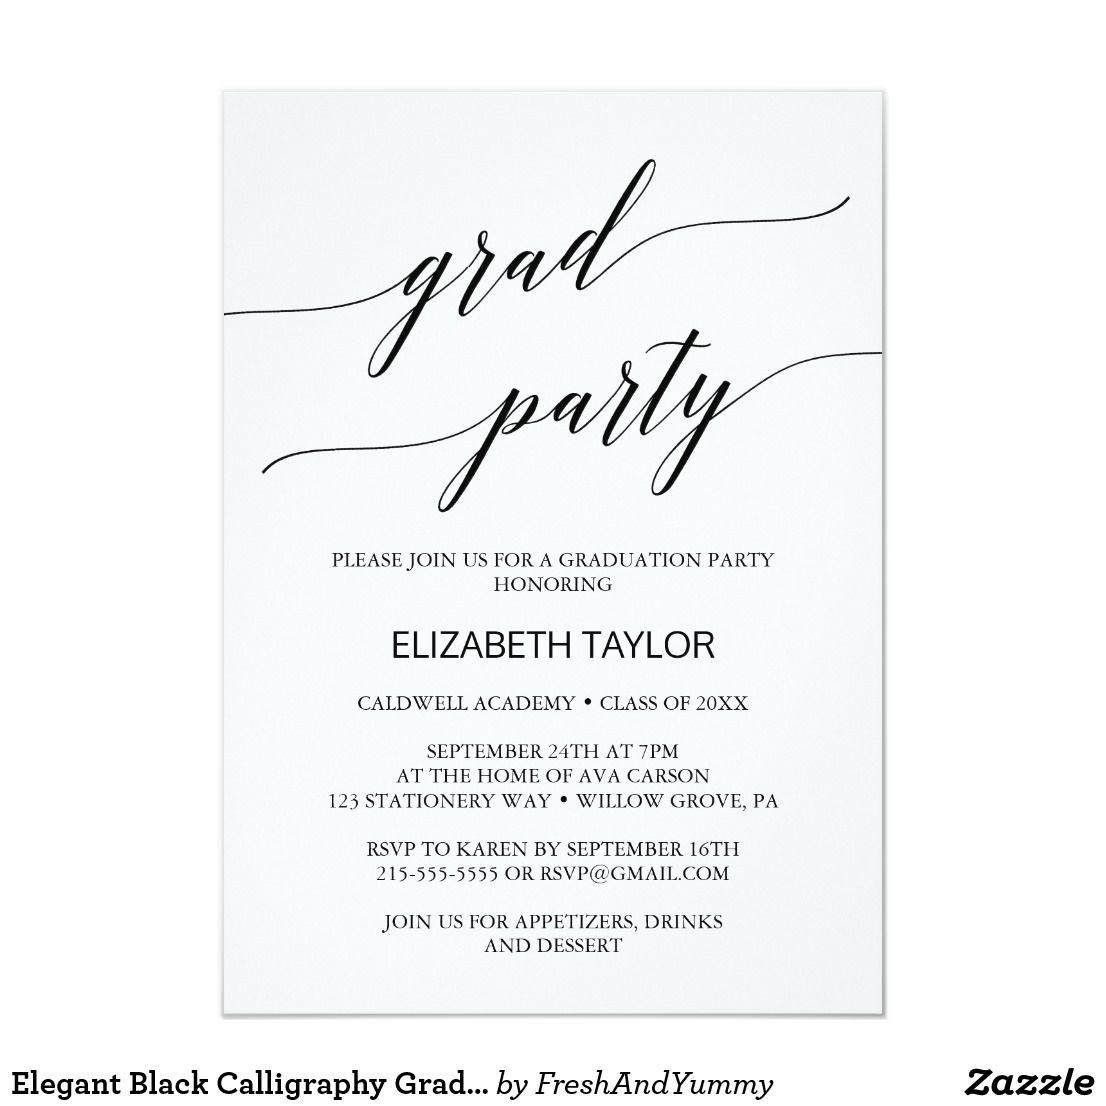 Elegant Black Calligraphy Graduation Party Invitation Zazzle Com Graduation Party Invitations Graduation Party Party Invitations